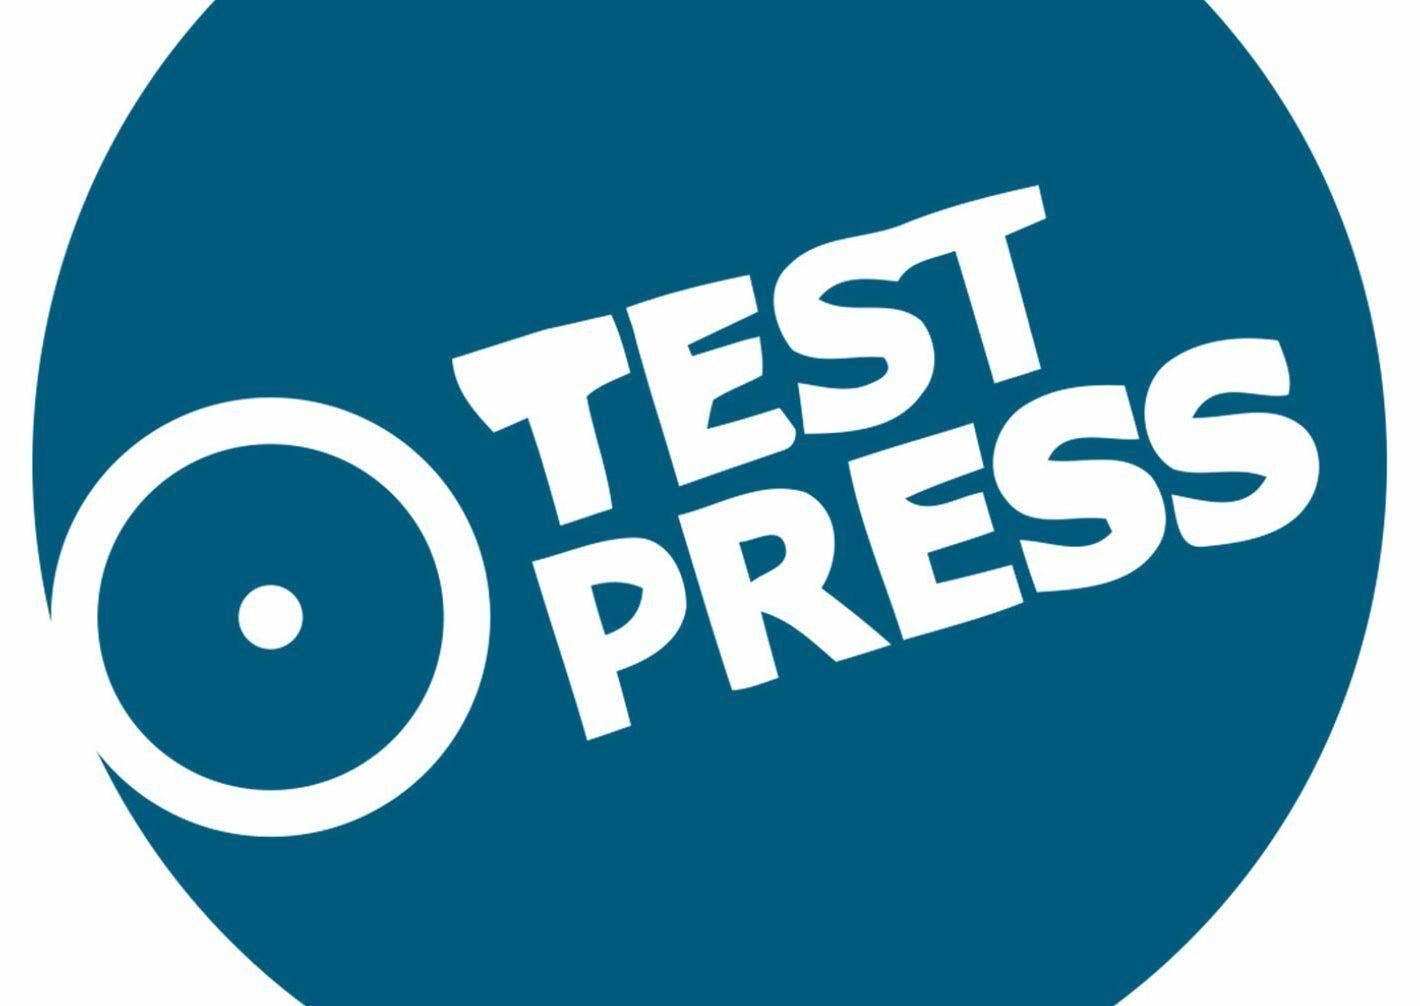 Плейлист Spotify: Total Test Press (июль 2020)